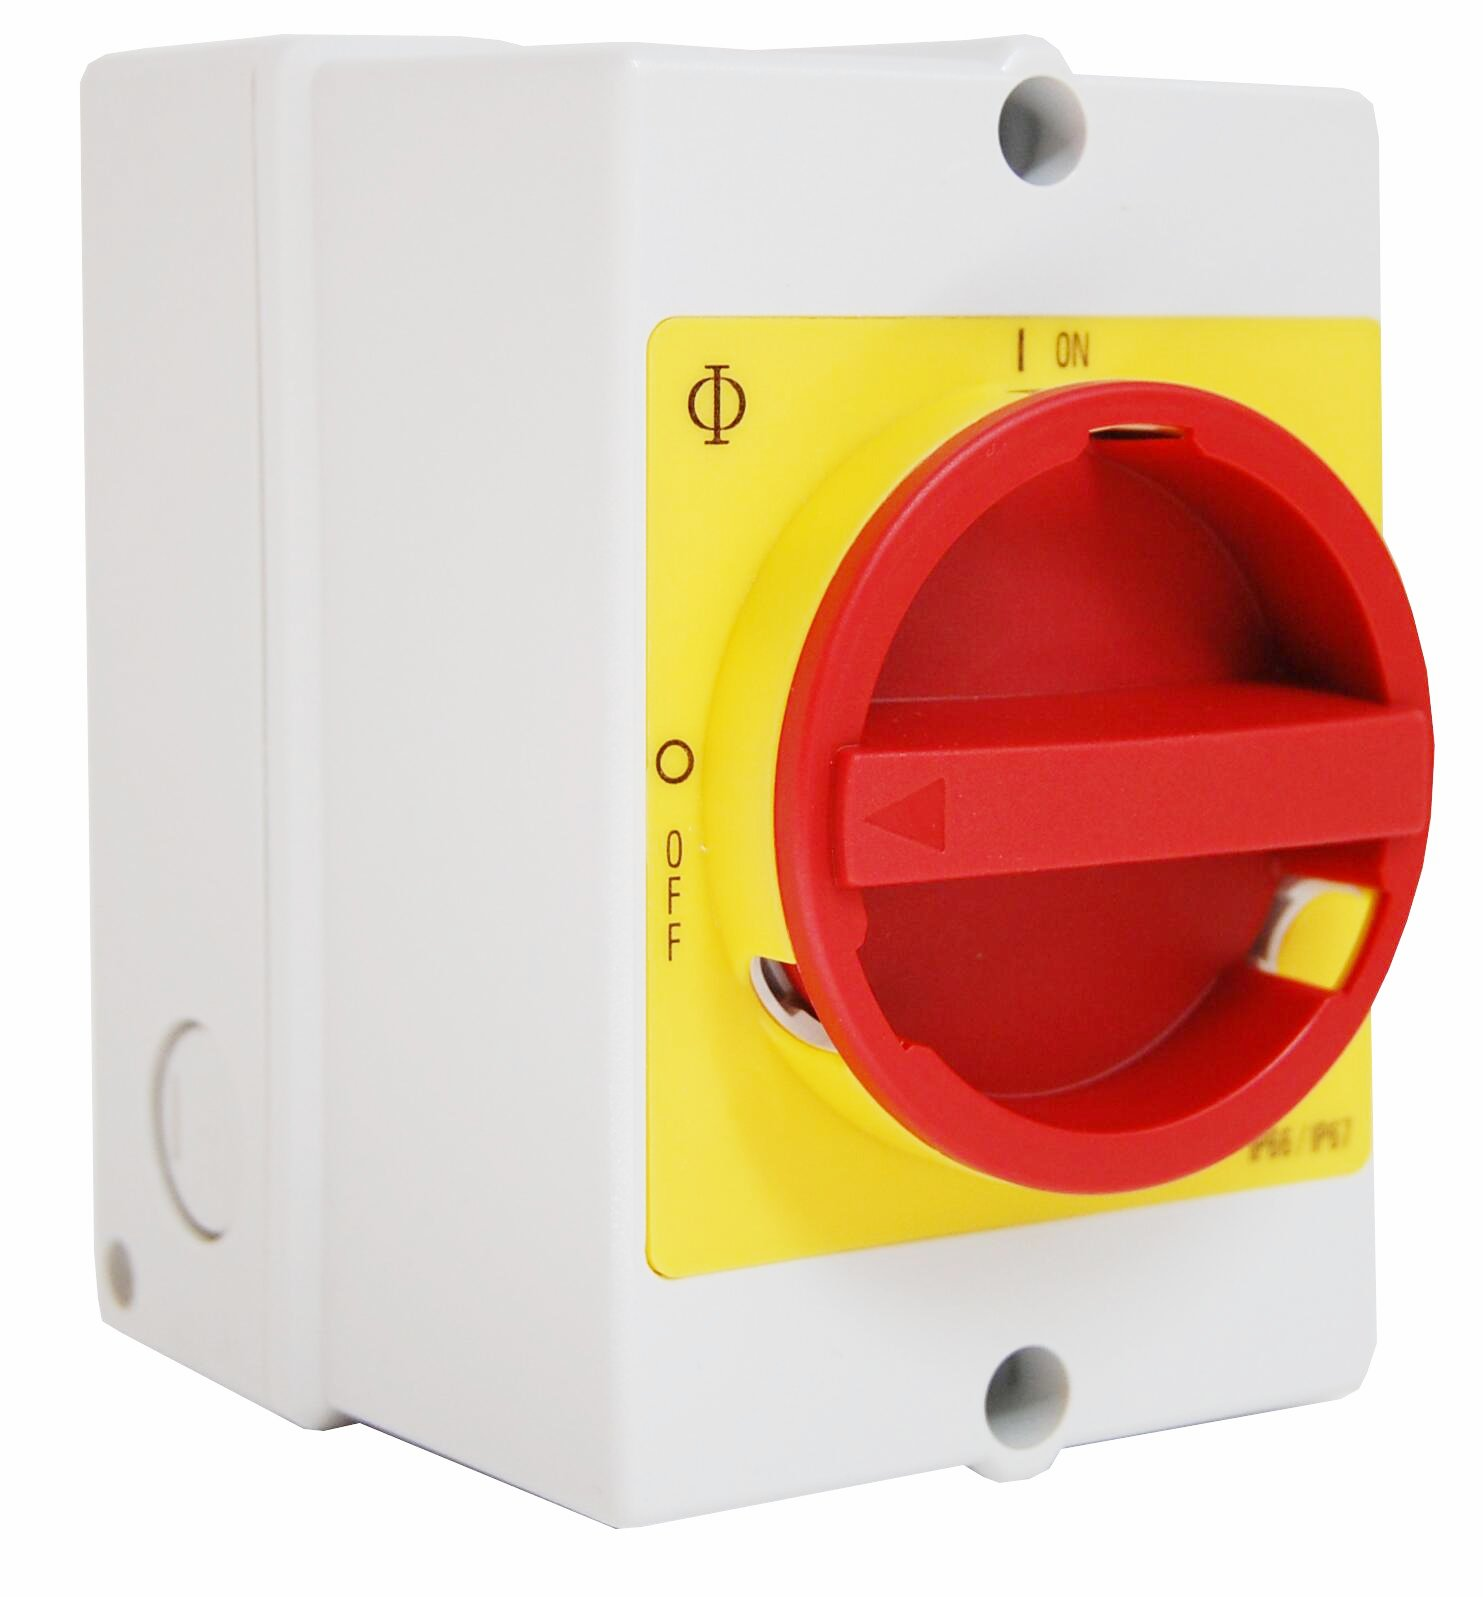 1 Stk Not-Aus-Schalter, 3-polig + 2 Hilfskontakte, PE-Klemme, 20A IN892016--